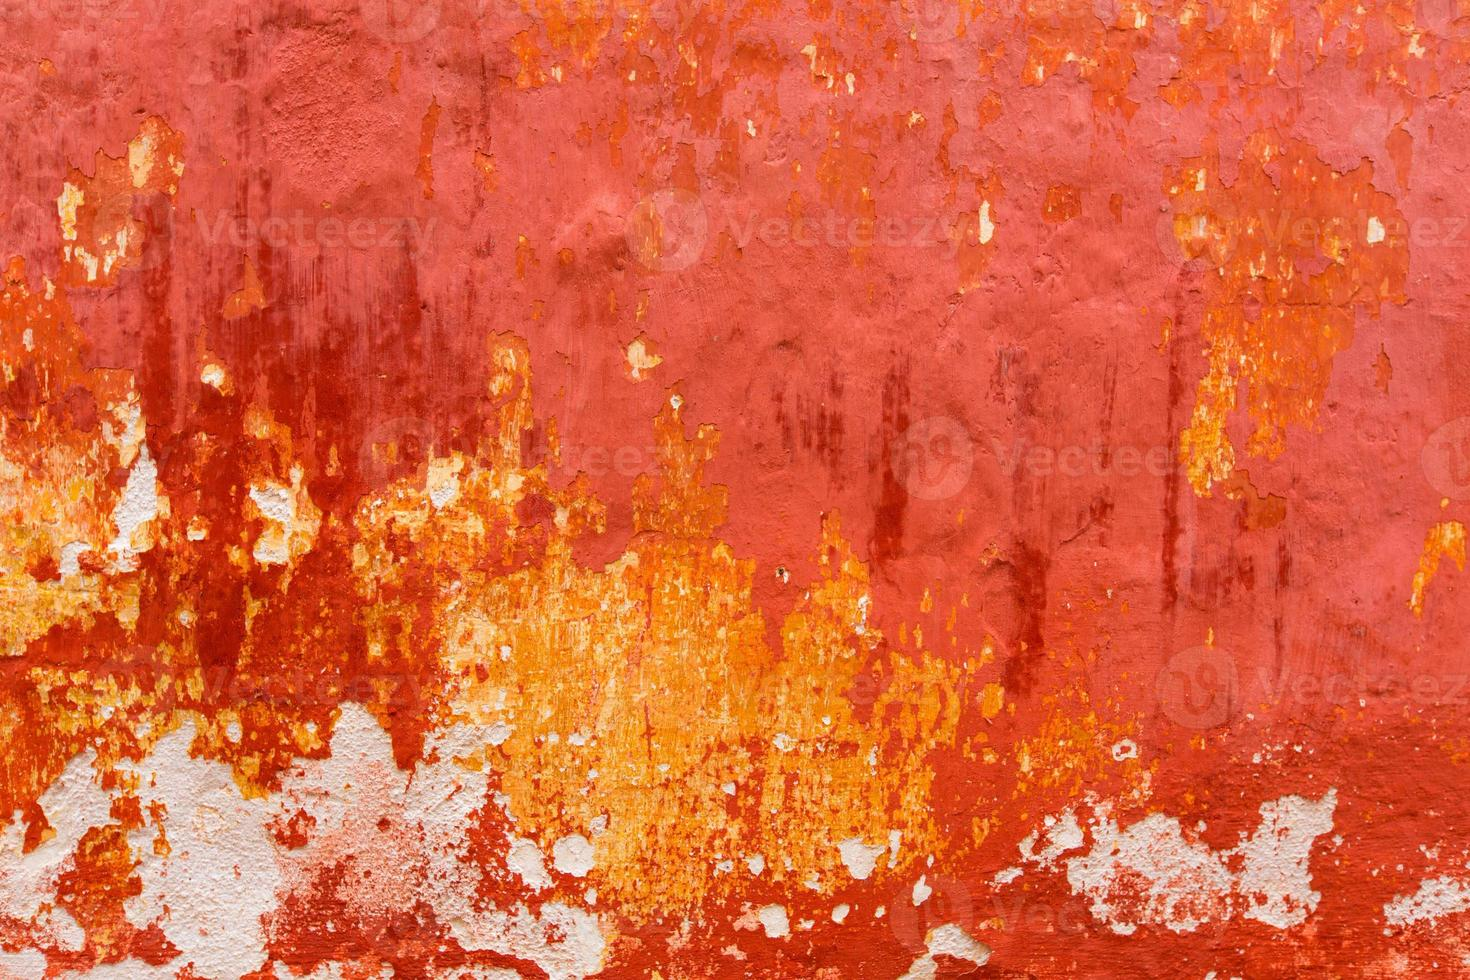 menorca ciutadella röd grunge fasad konsistens foto